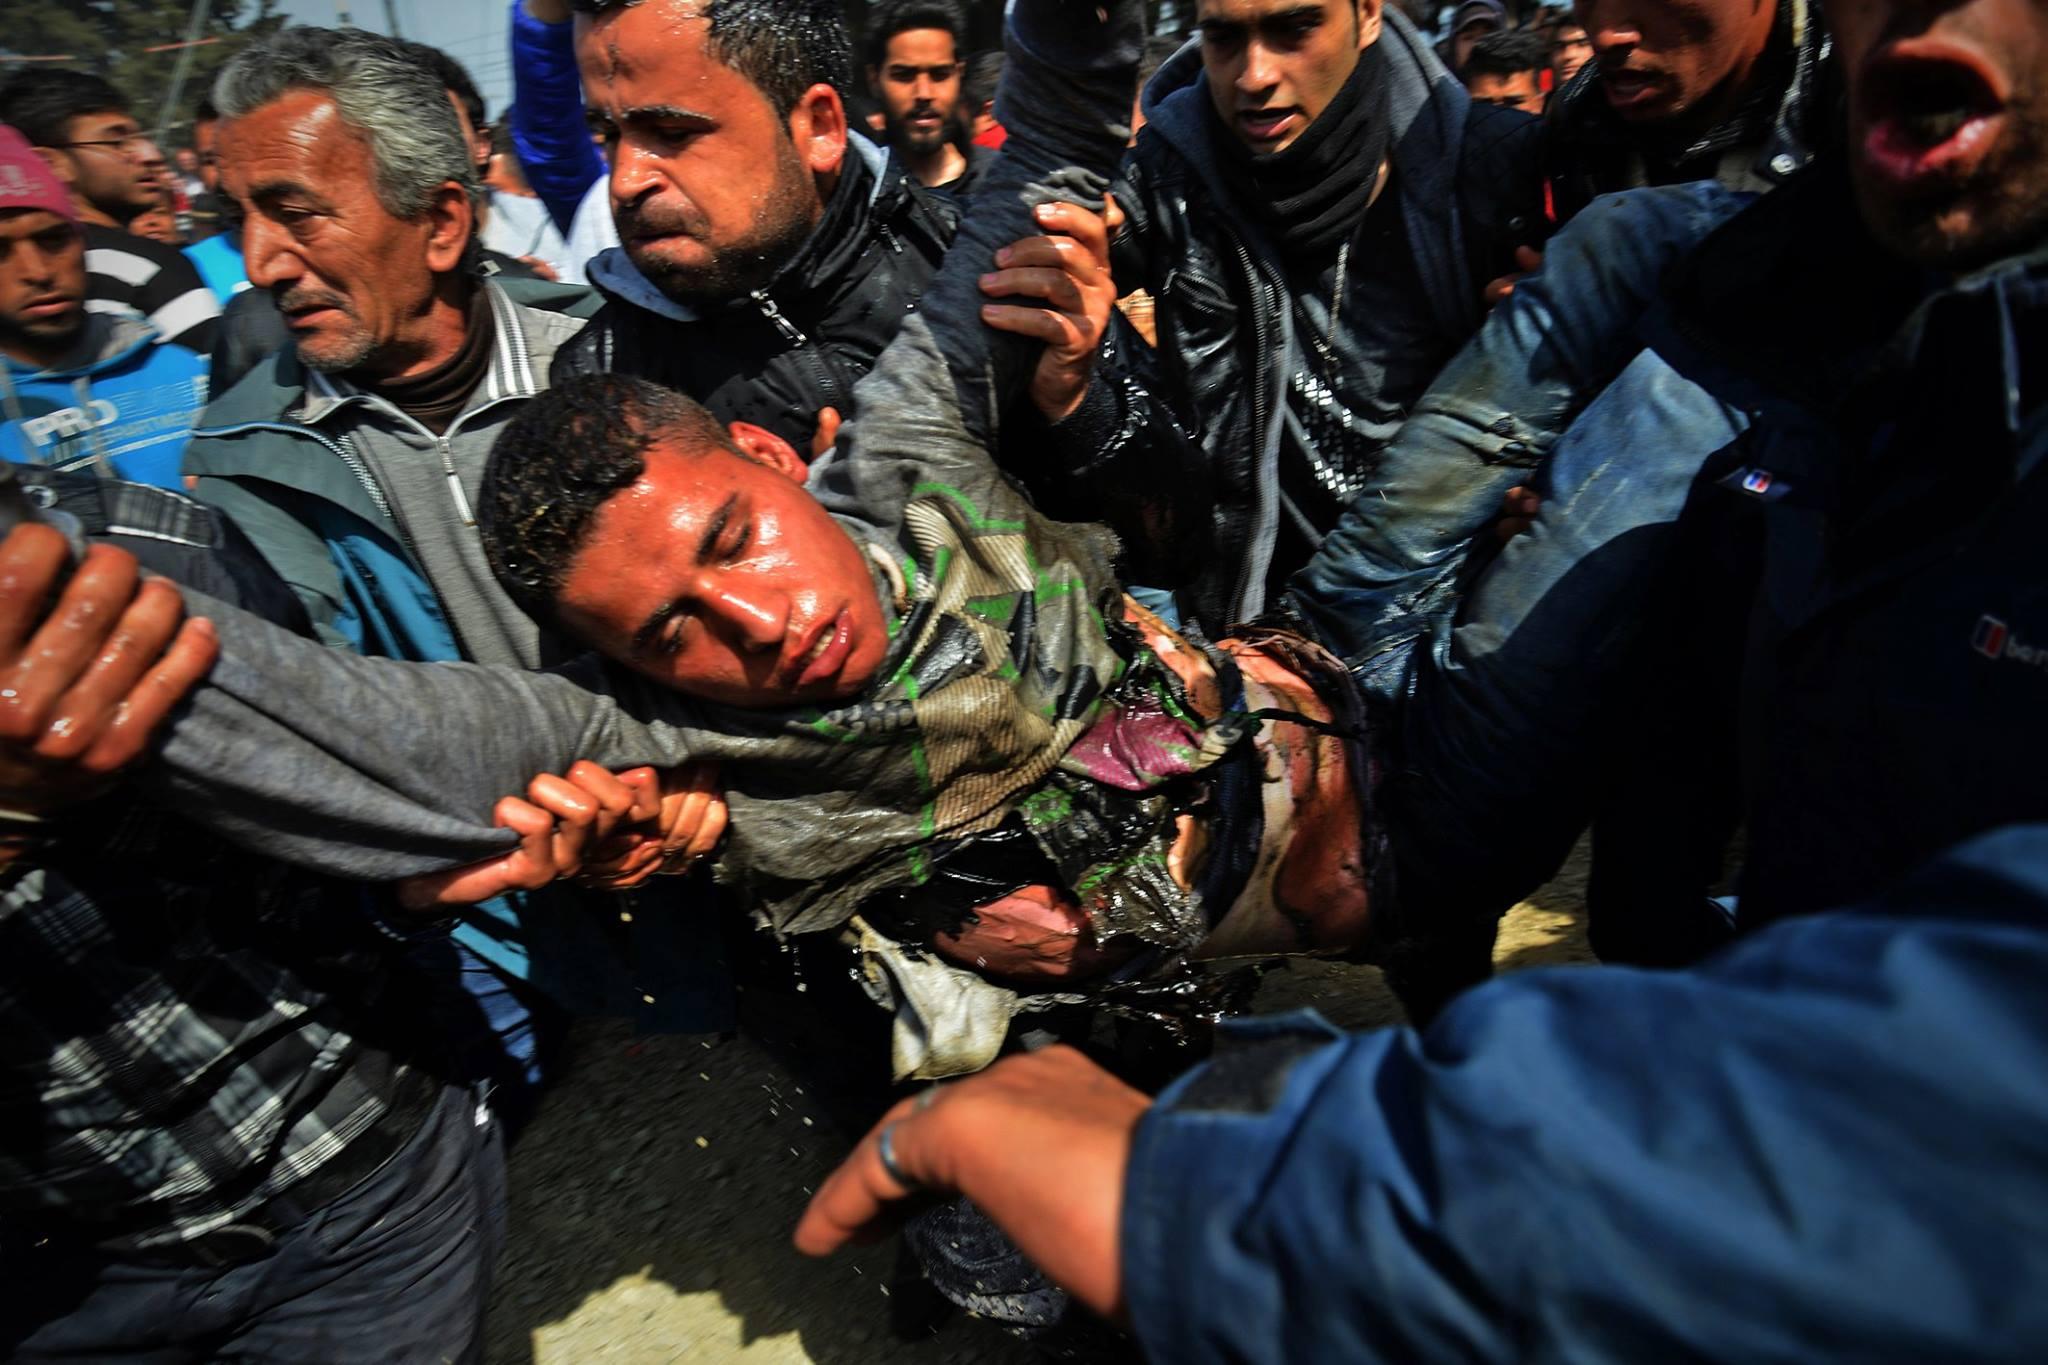 refugiado se prende fuego en idomeni